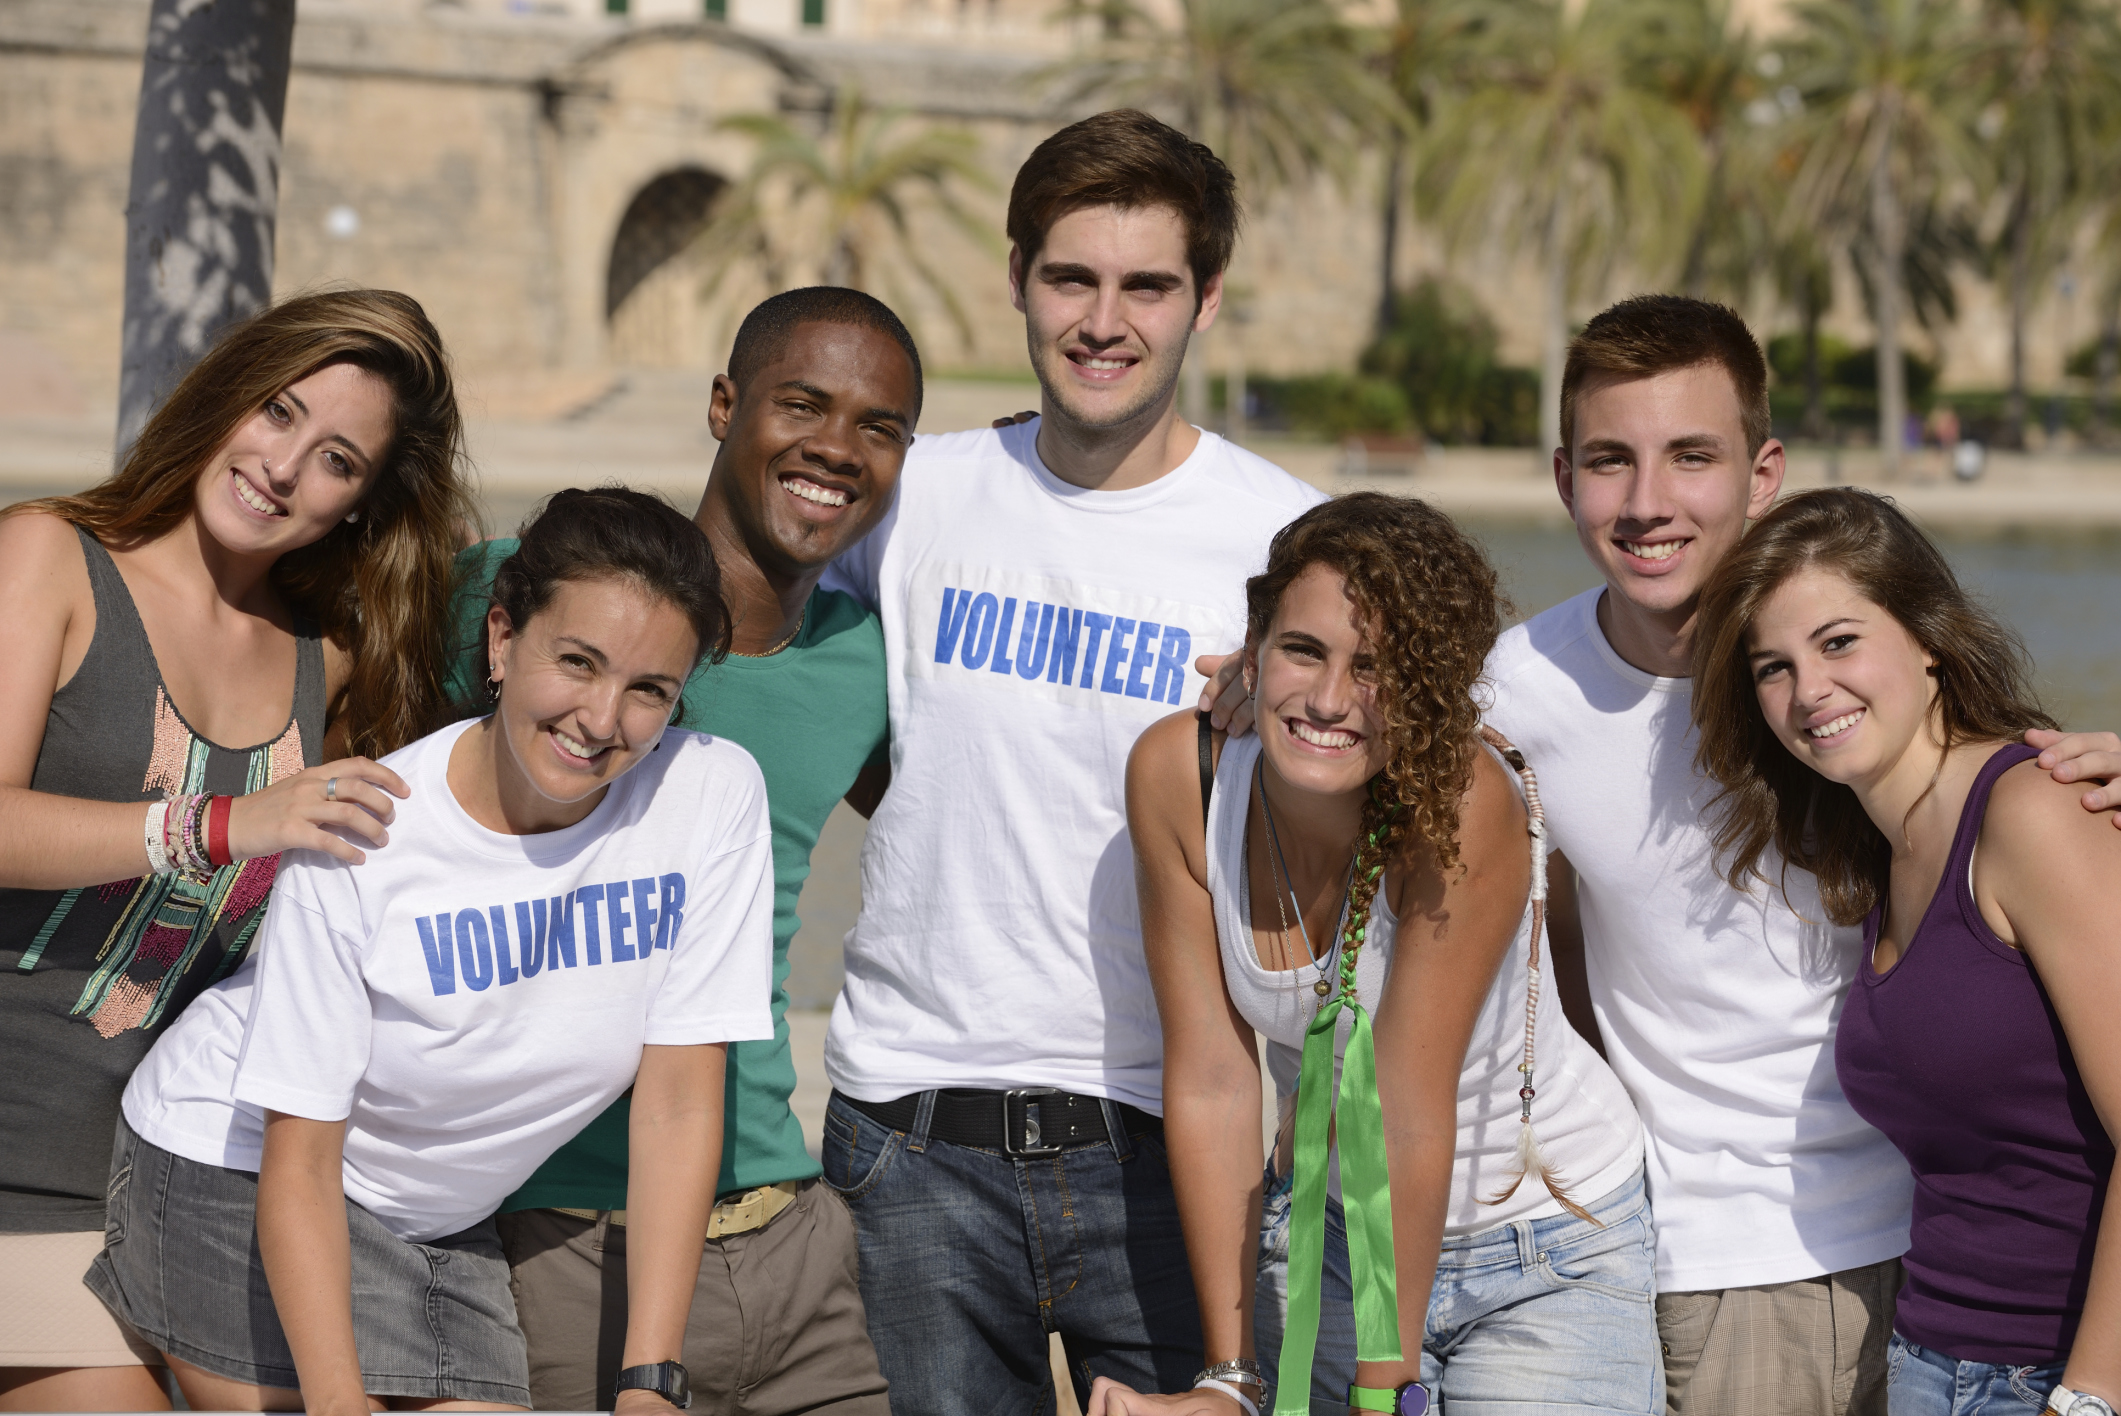 Happy volunteer group